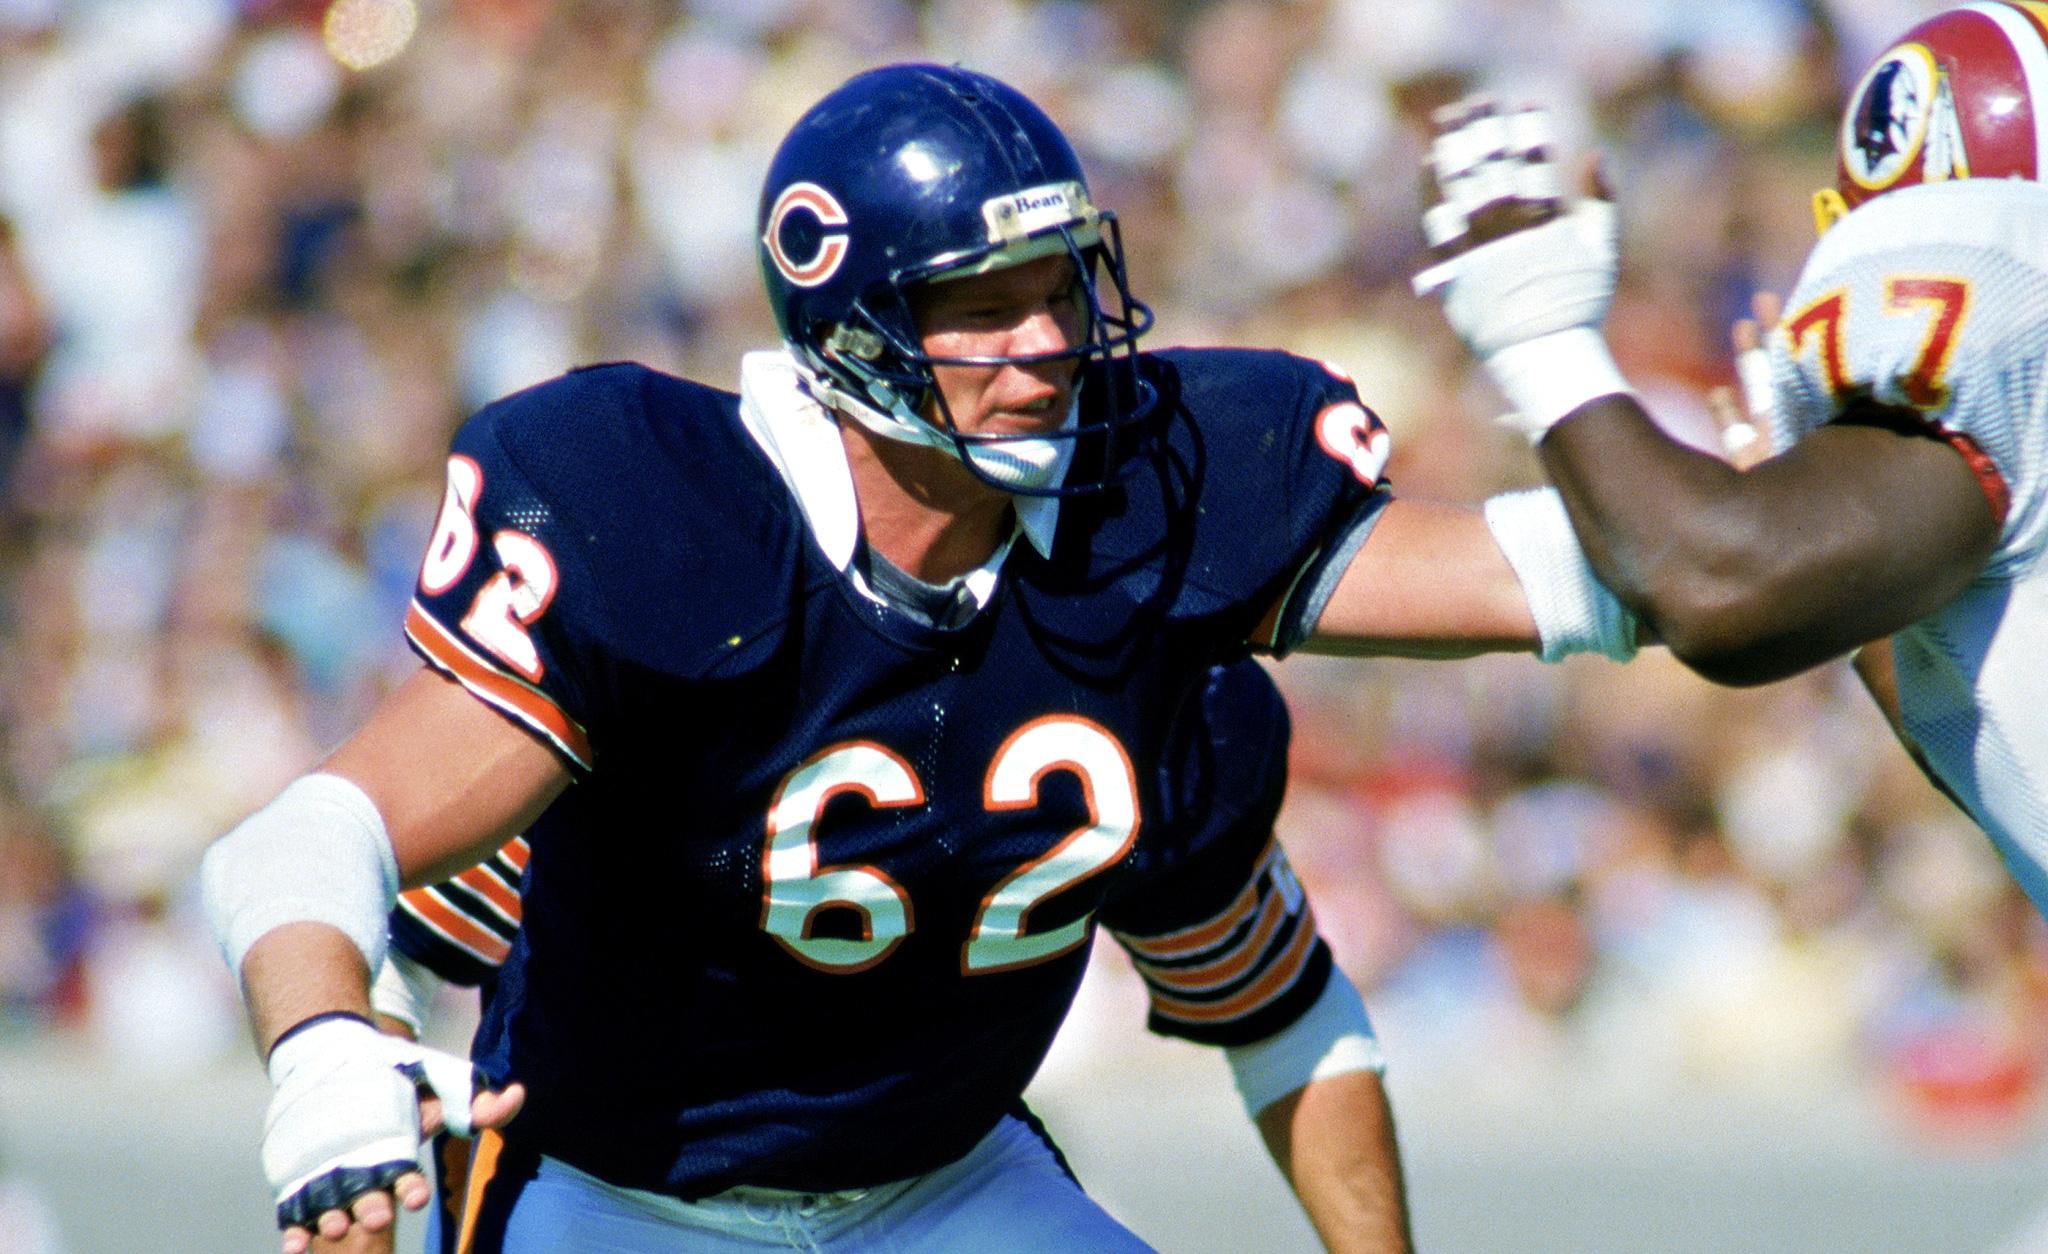 No. 42: Mark Bortz - 50 Greatest Bears - ESPN